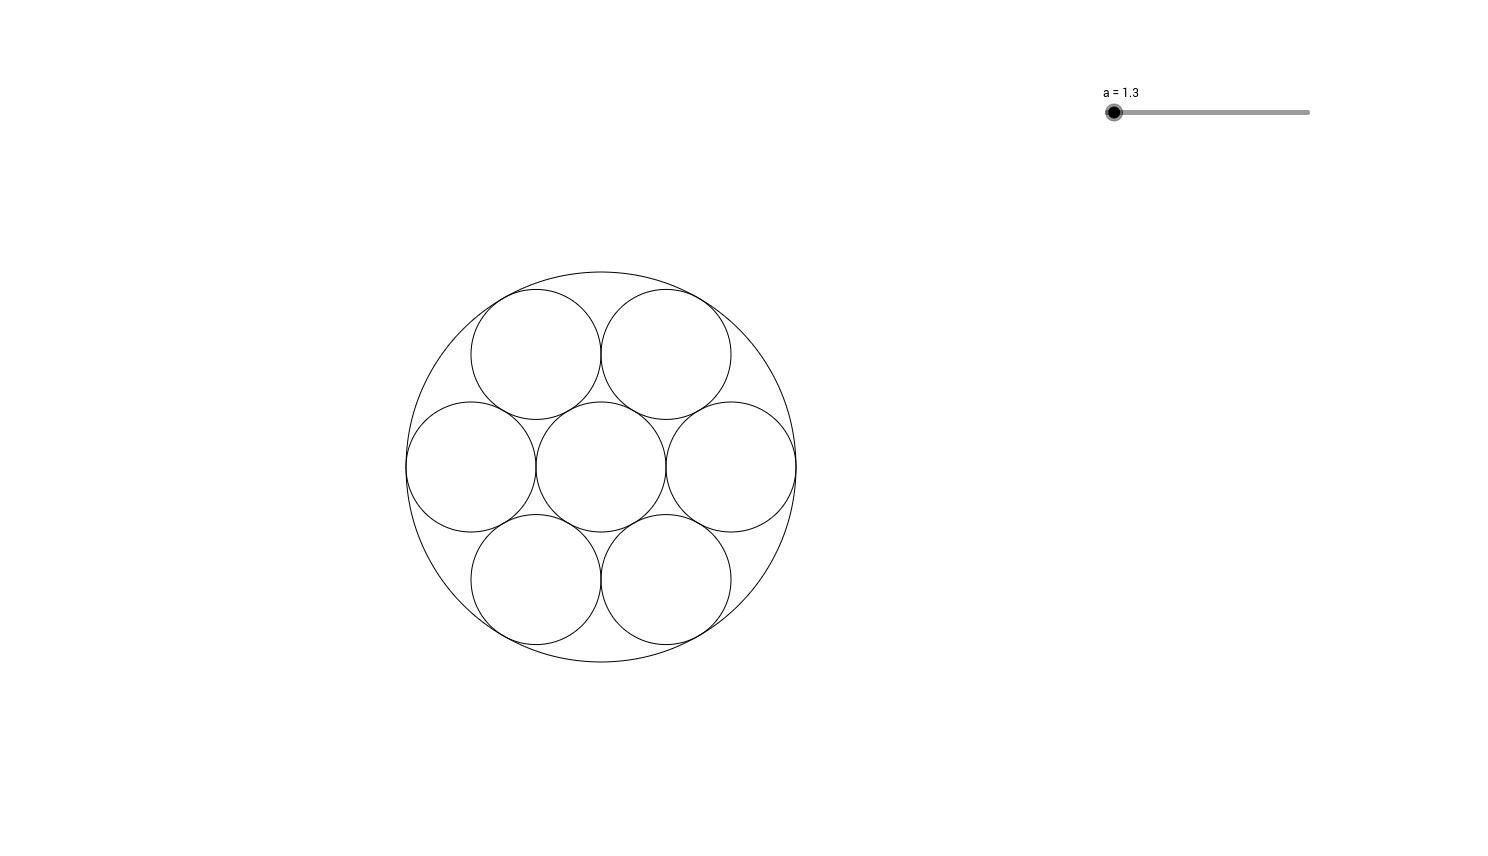 8 circles construction